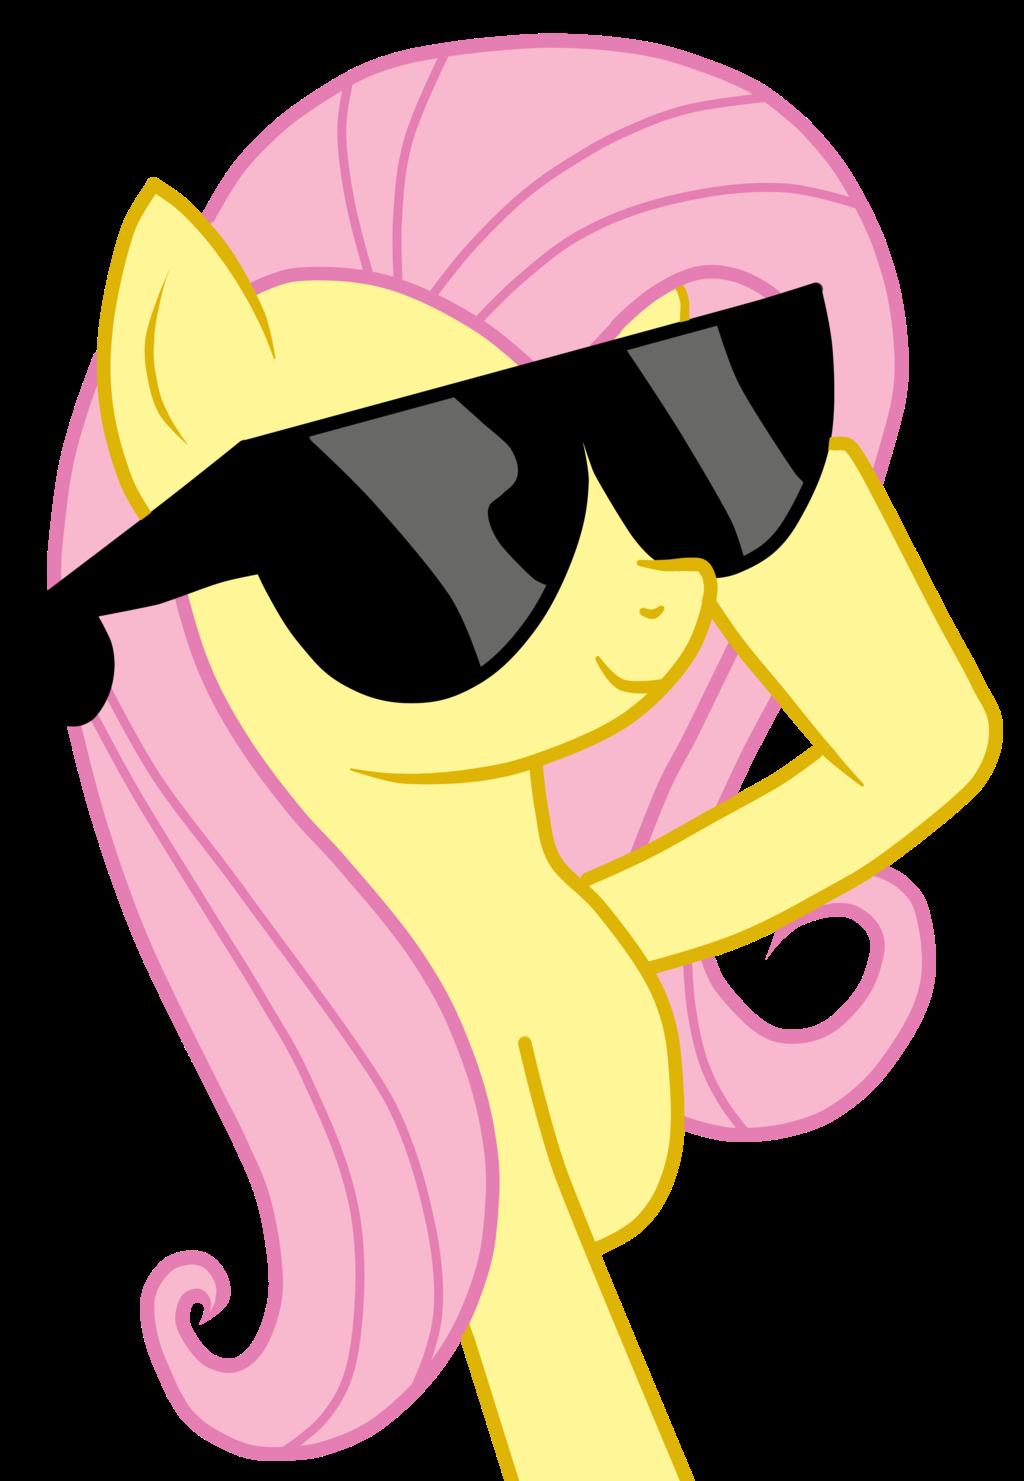 Swag clipart cute glass AND Cute Cute Awesome Equestria